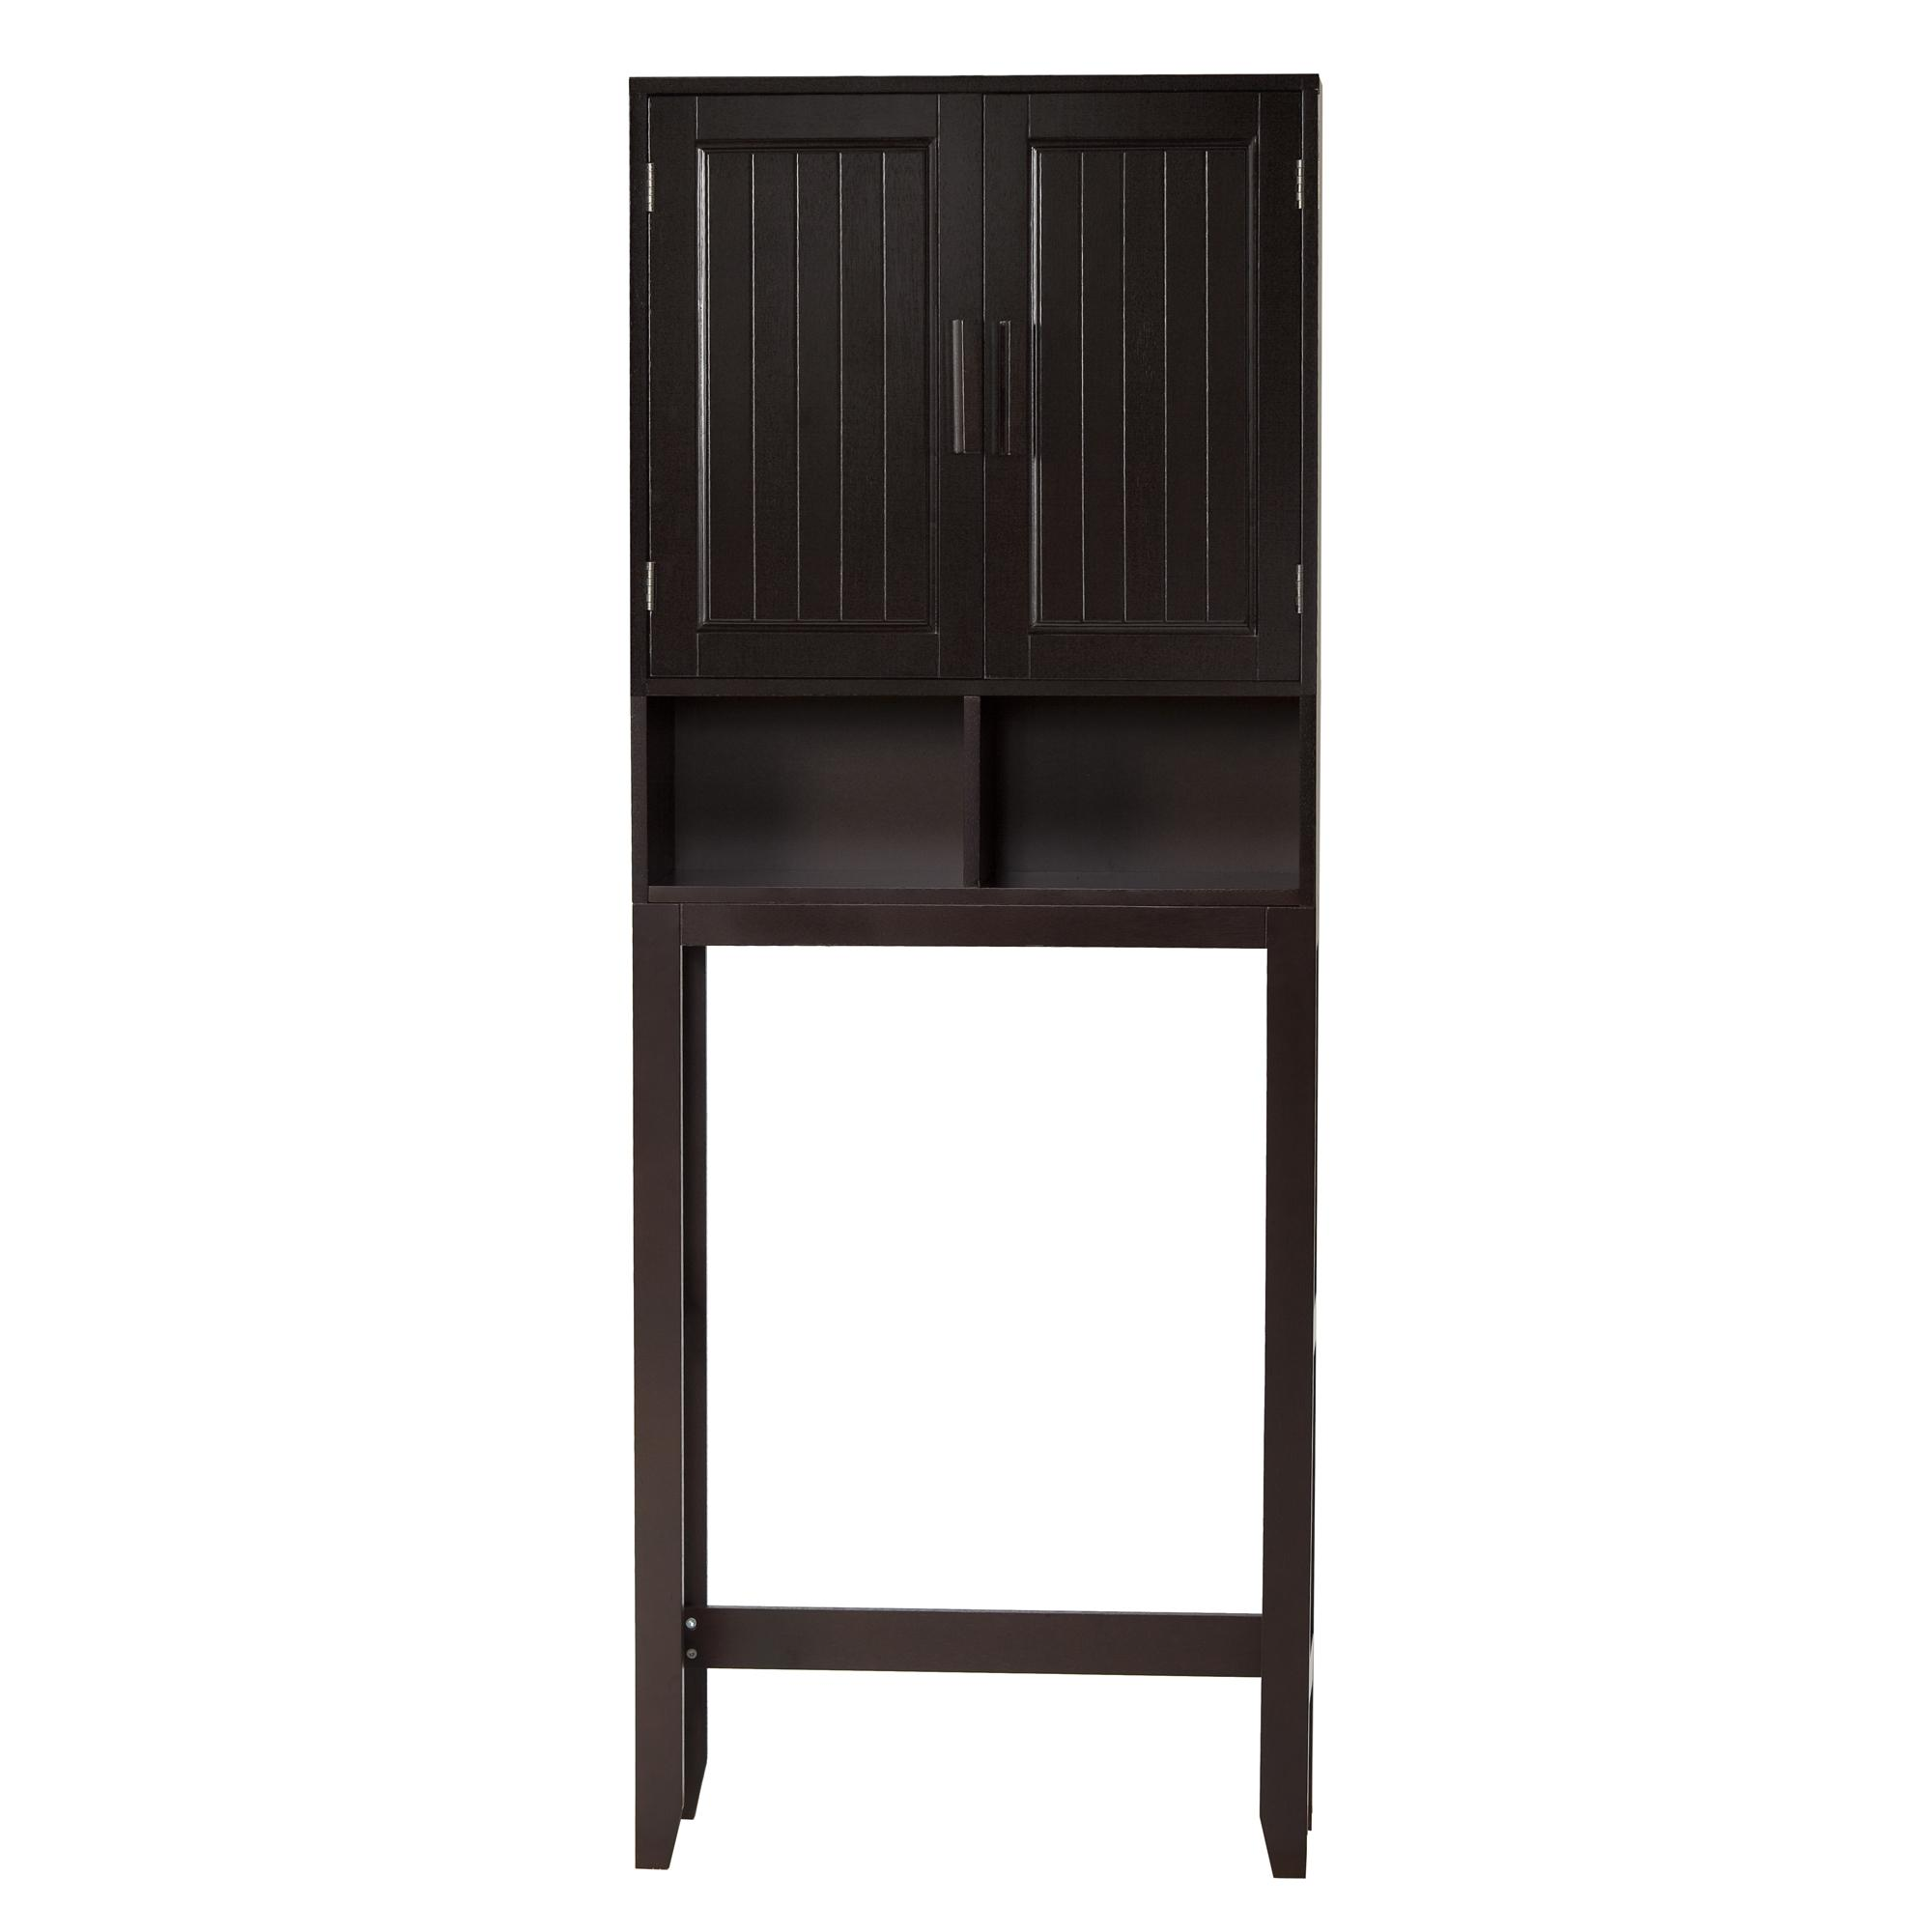 Covington Dark Espresso Space Saver by Elegant Home Fashions